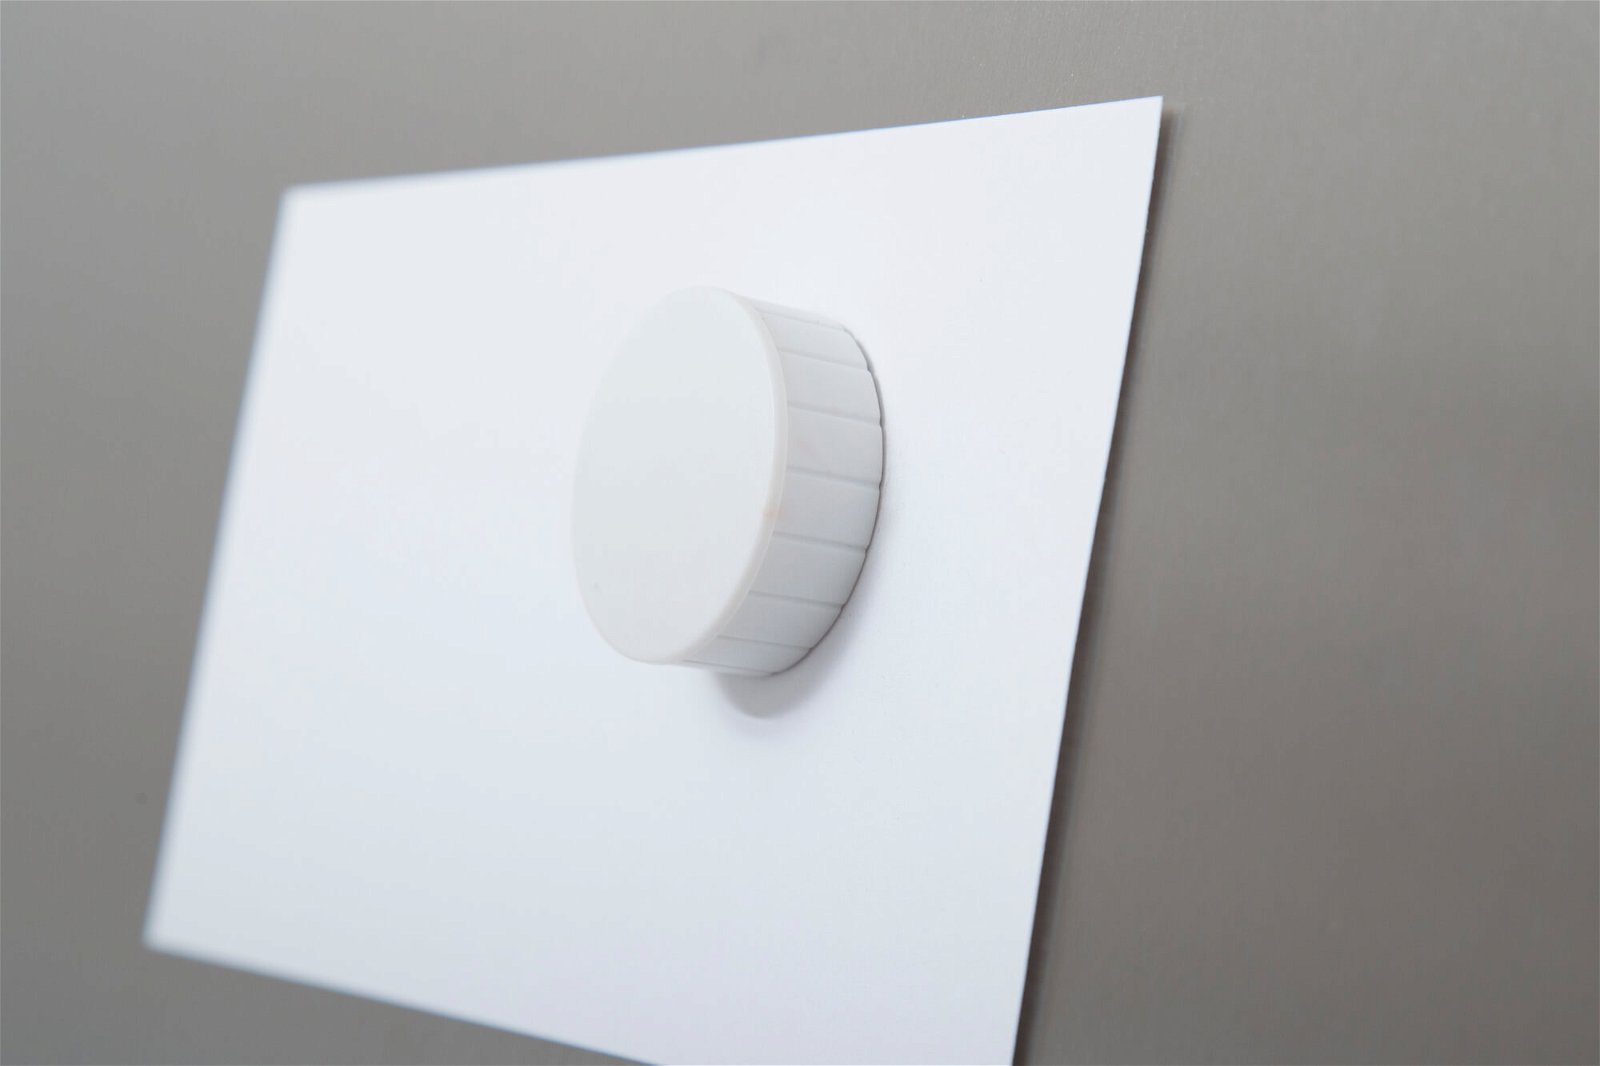 Magnet MAULsolid Ø 38 mm, 2,5 kg Haftkraft, 10 St./Ktn., weiß